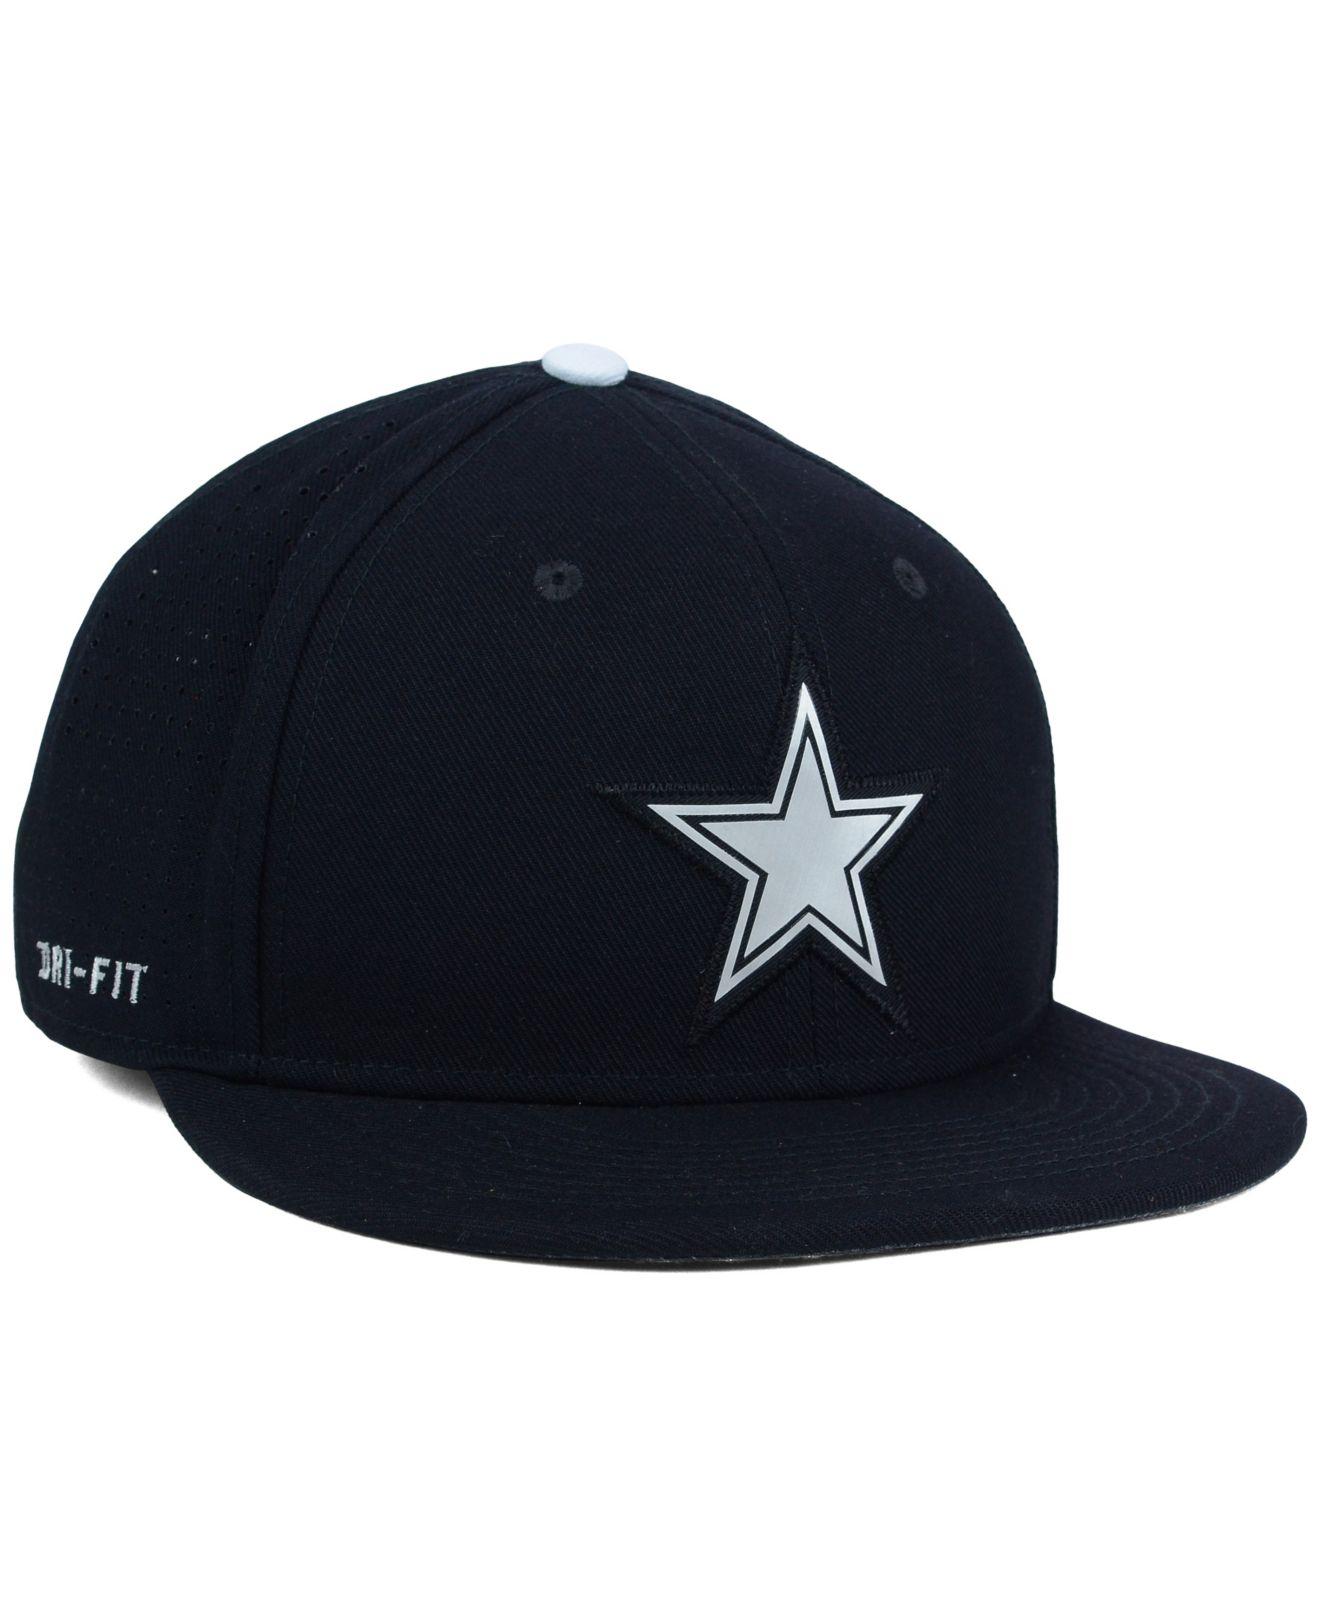 9c9a03fddbc Lyst - Nike Dallas Cowboys True Vapor Fitted Cap in Black for Men